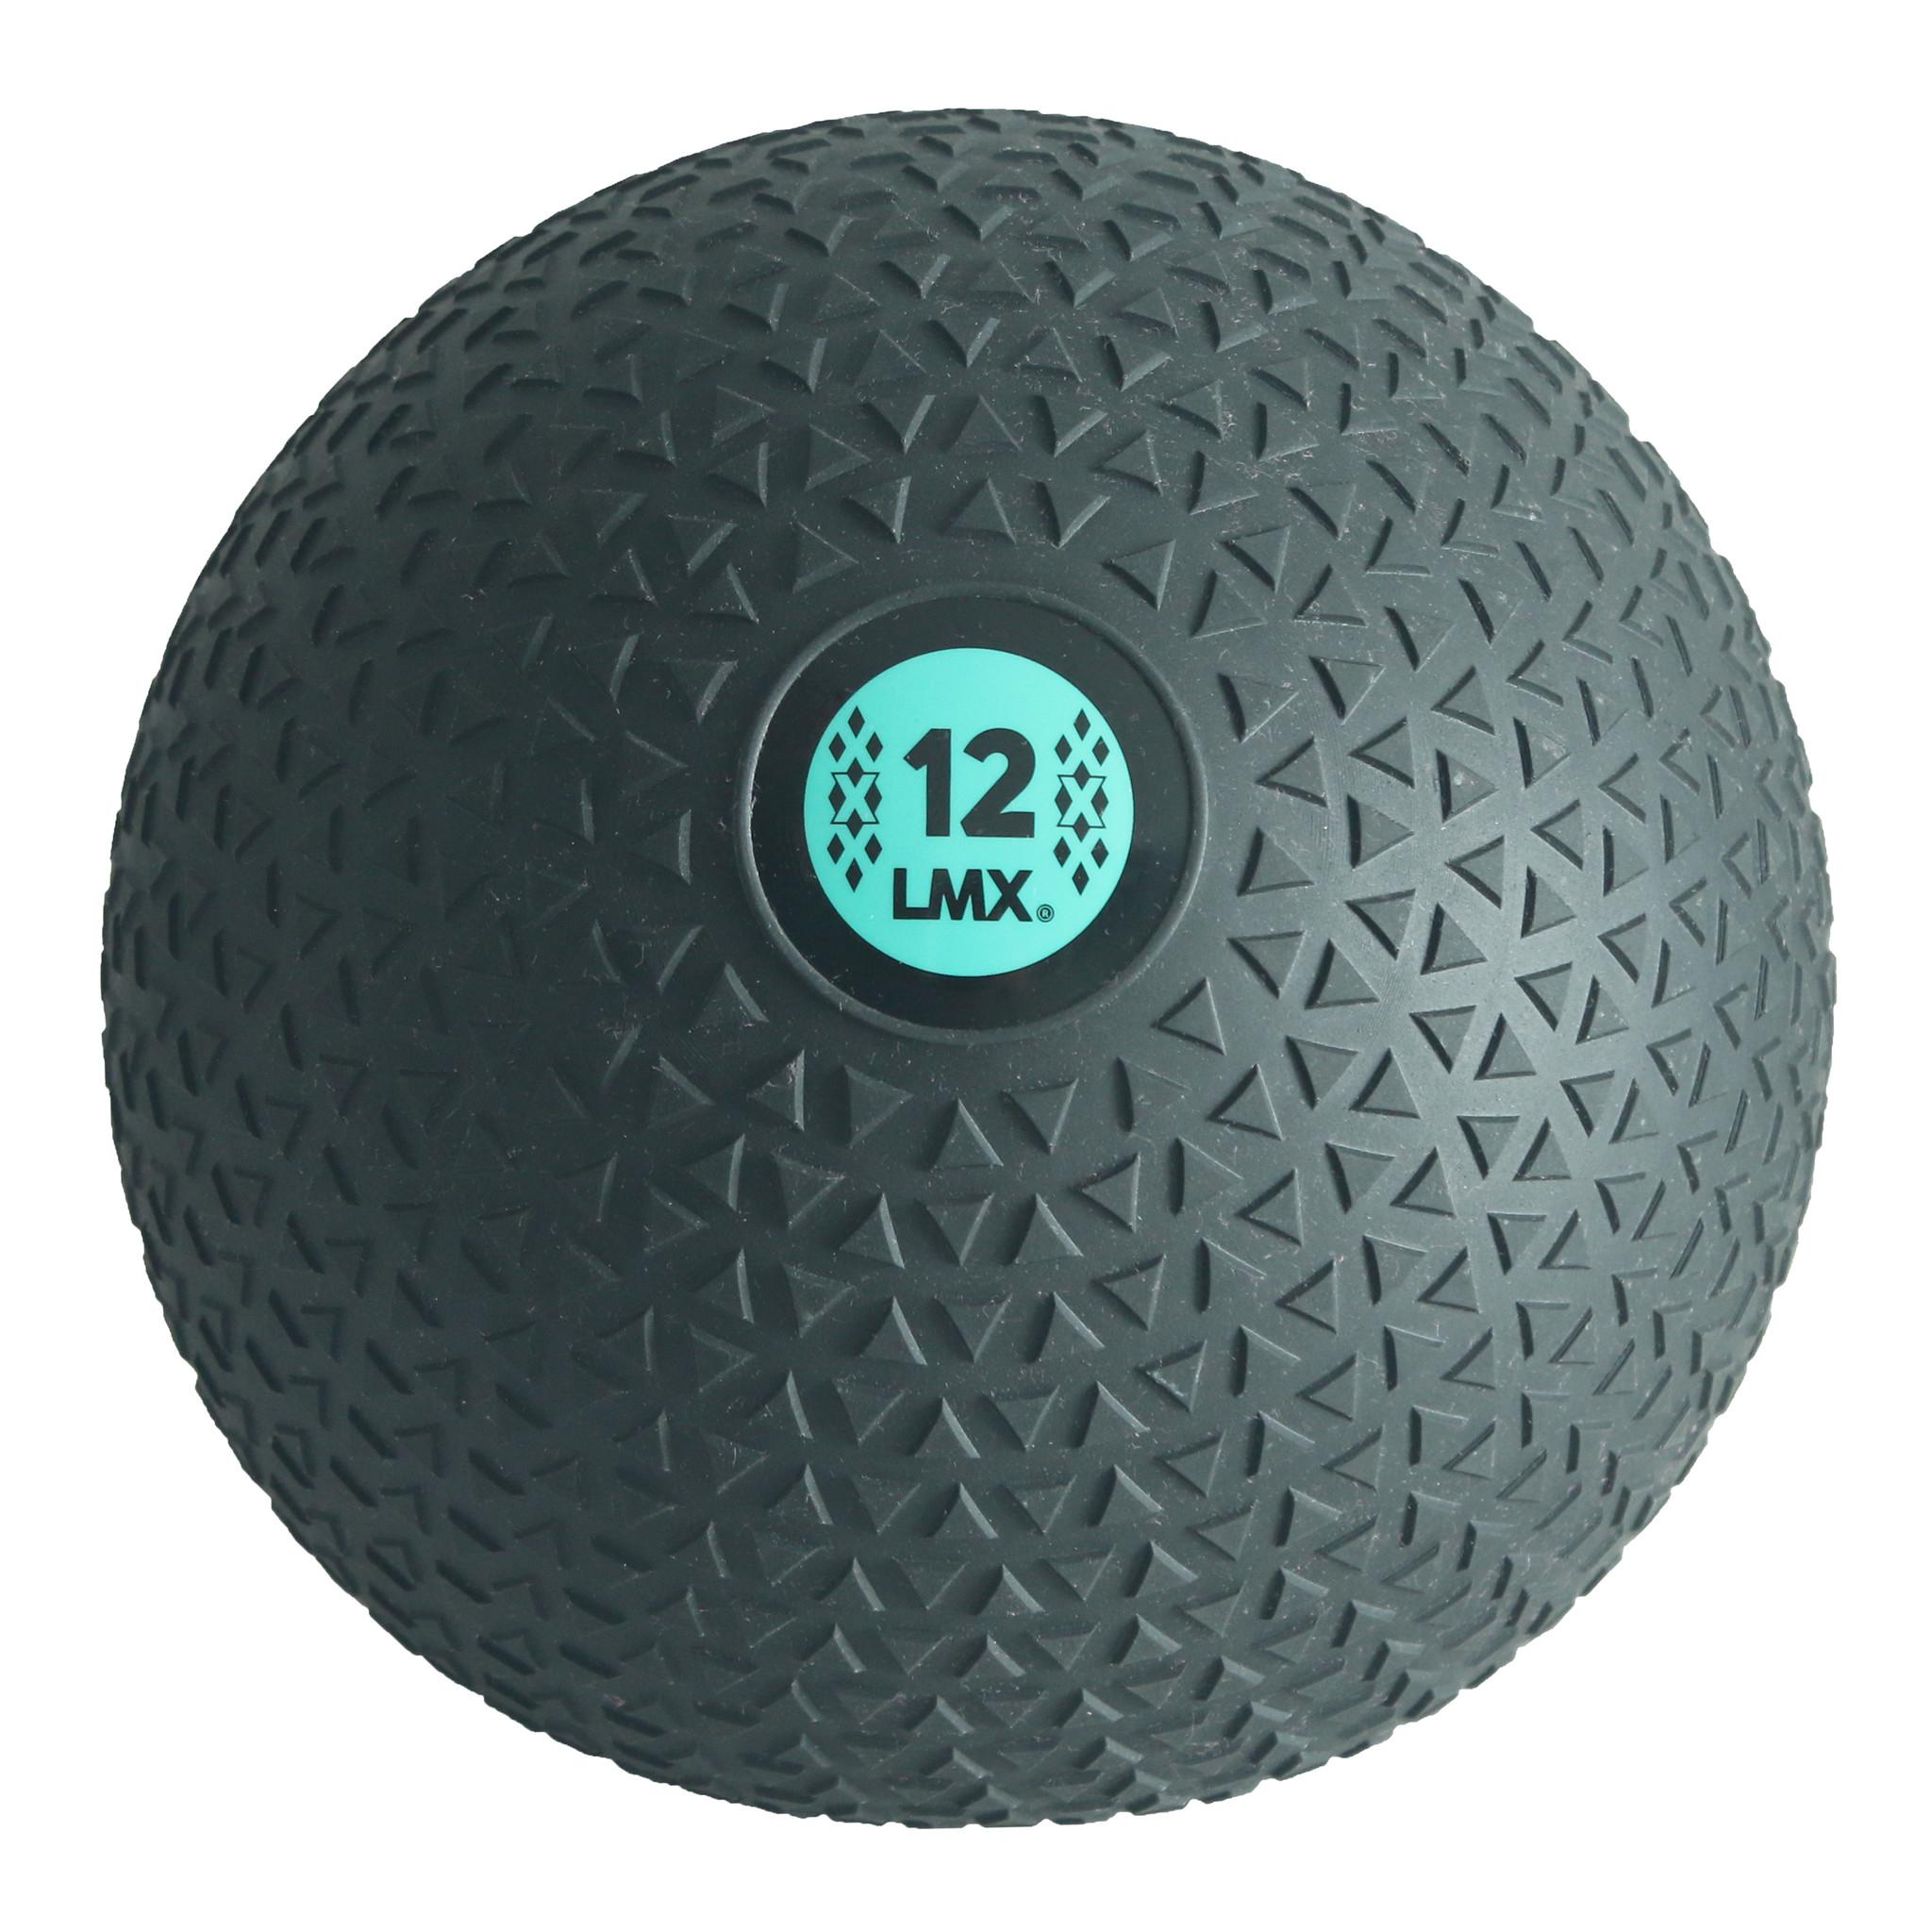 LMX Slamball - Slam Ball - Fitnessbal - 12 kilo jokasport.nl